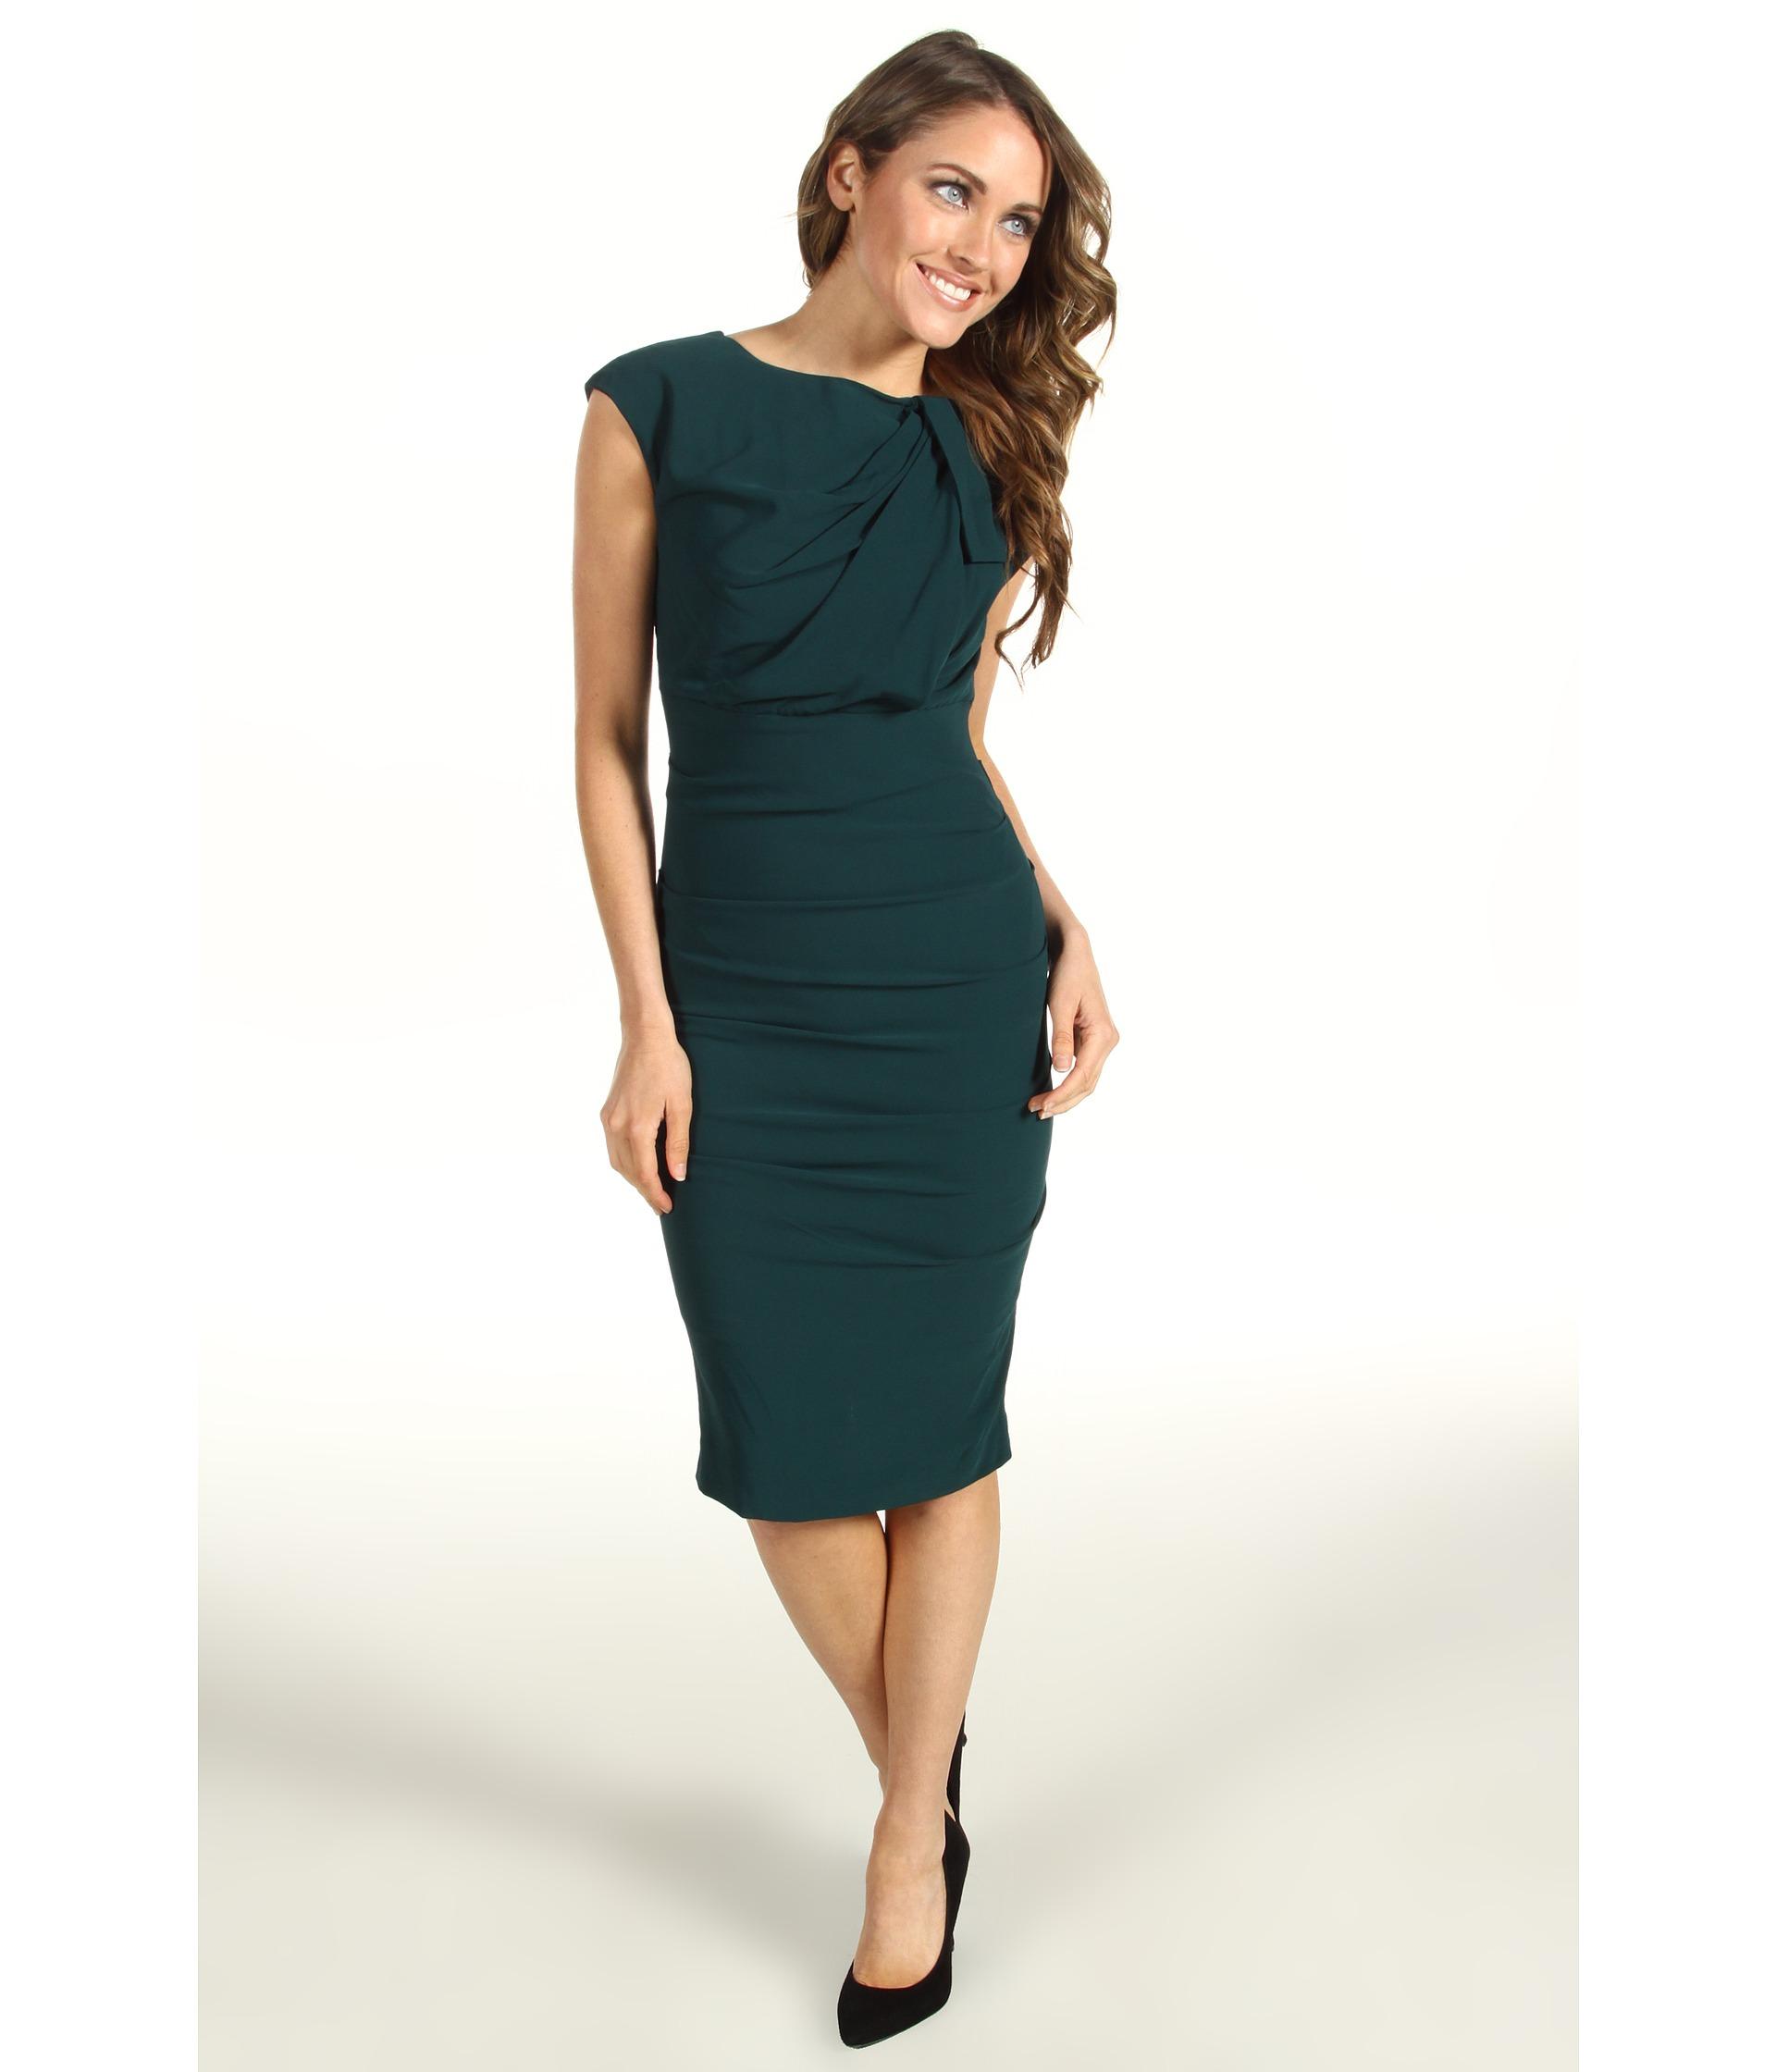 Nicole Miller Tidal Pleated Stretch Crepe Dress $319.99 $355.00 SALE